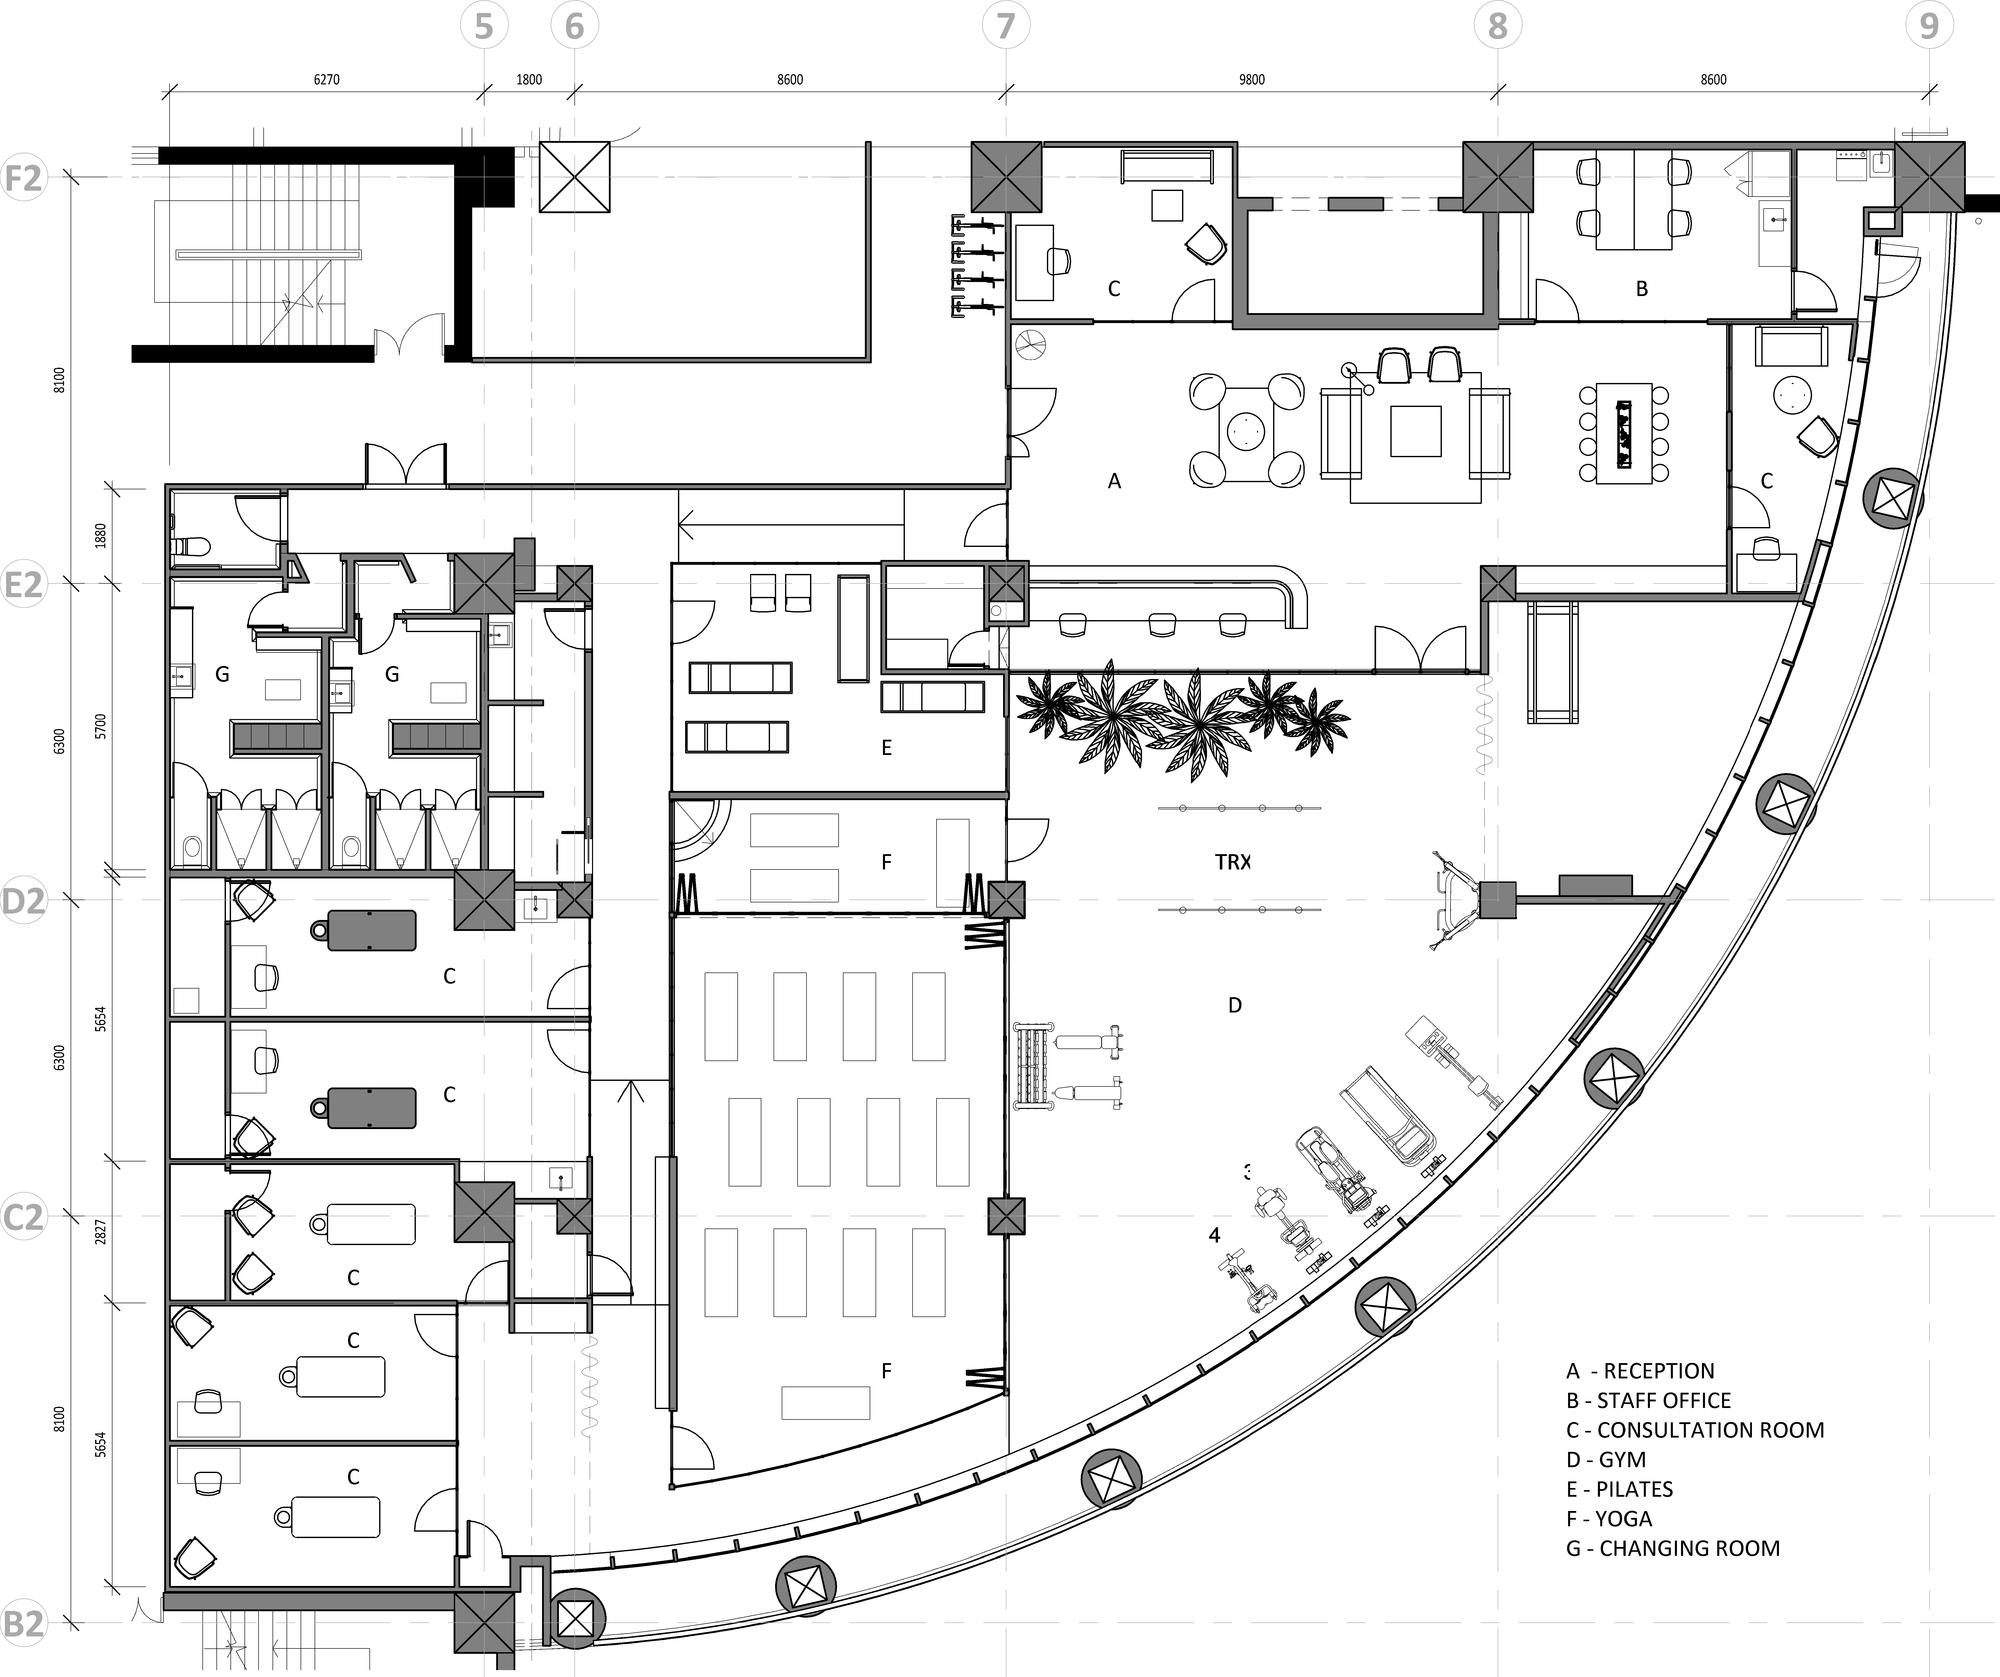 Mentmore towers floor plan 100 mentmore towers floor plan for 100 floor level 58